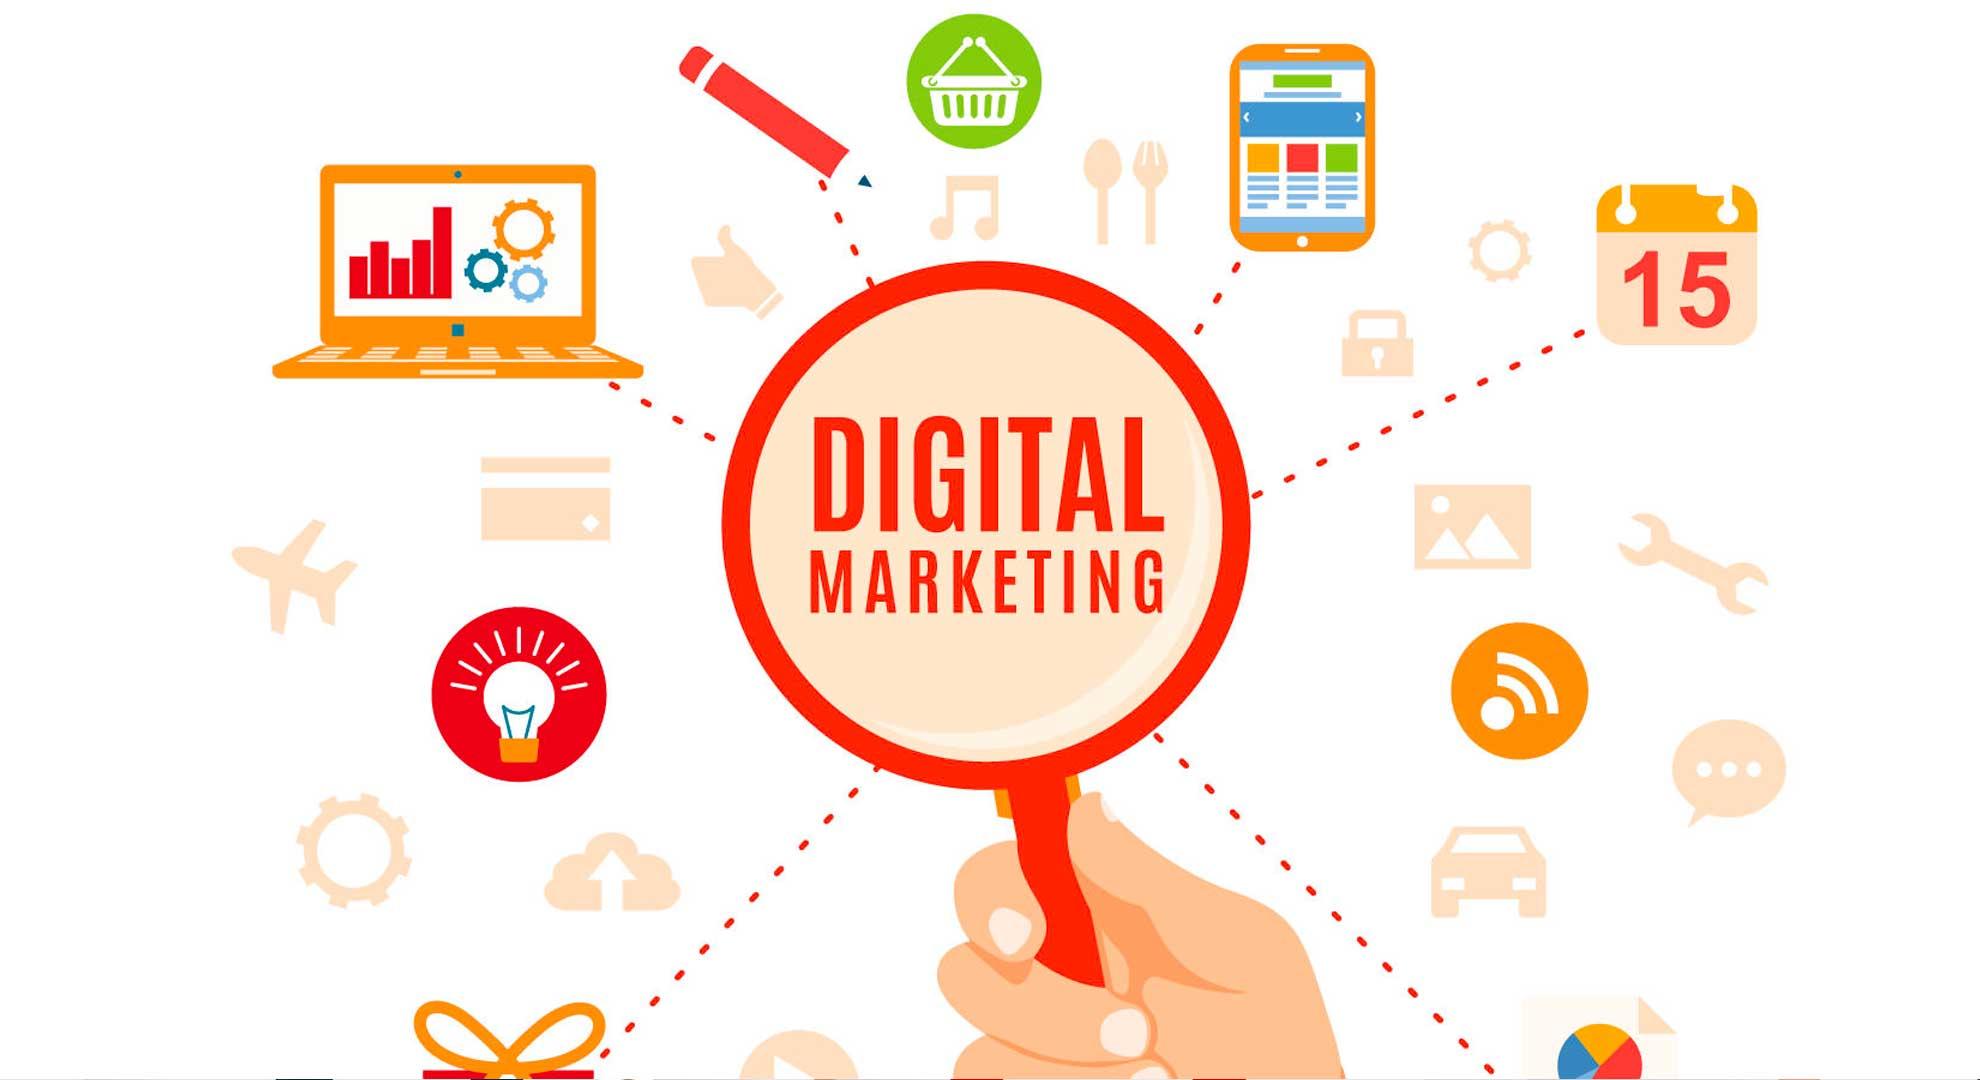 Agence premier en marketing digital